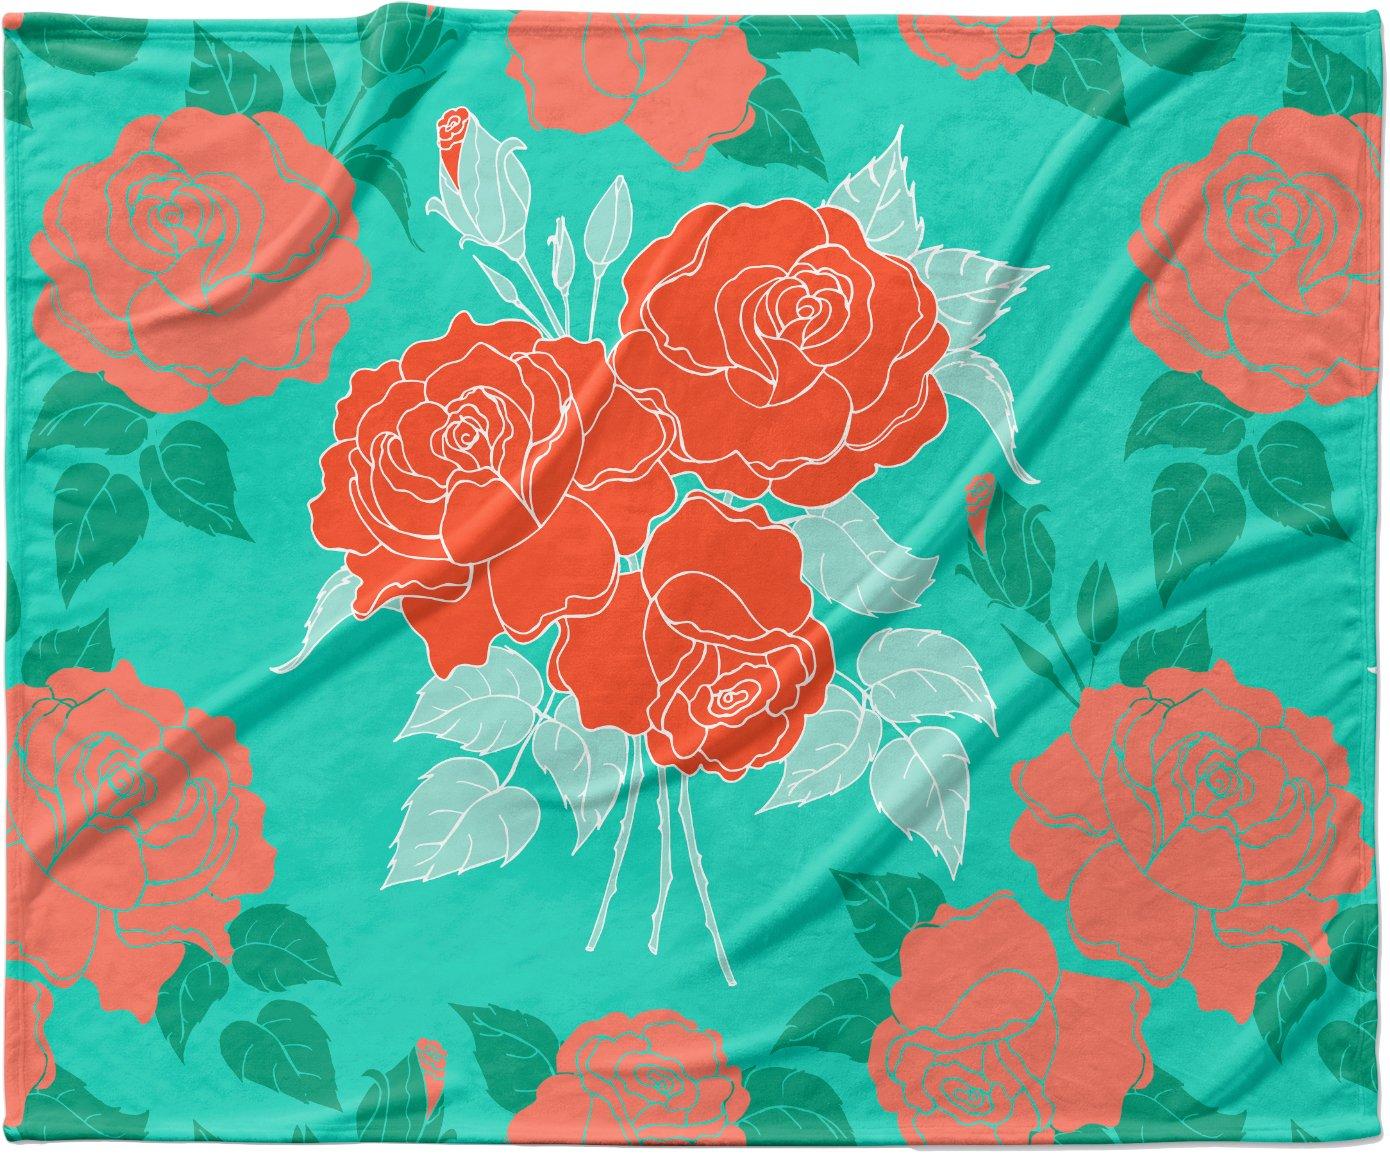 KESS InHouse Anneline Sophia 'Summer Rose Orange' Teal Green Fleece Baby Blanket, 40' x 30'